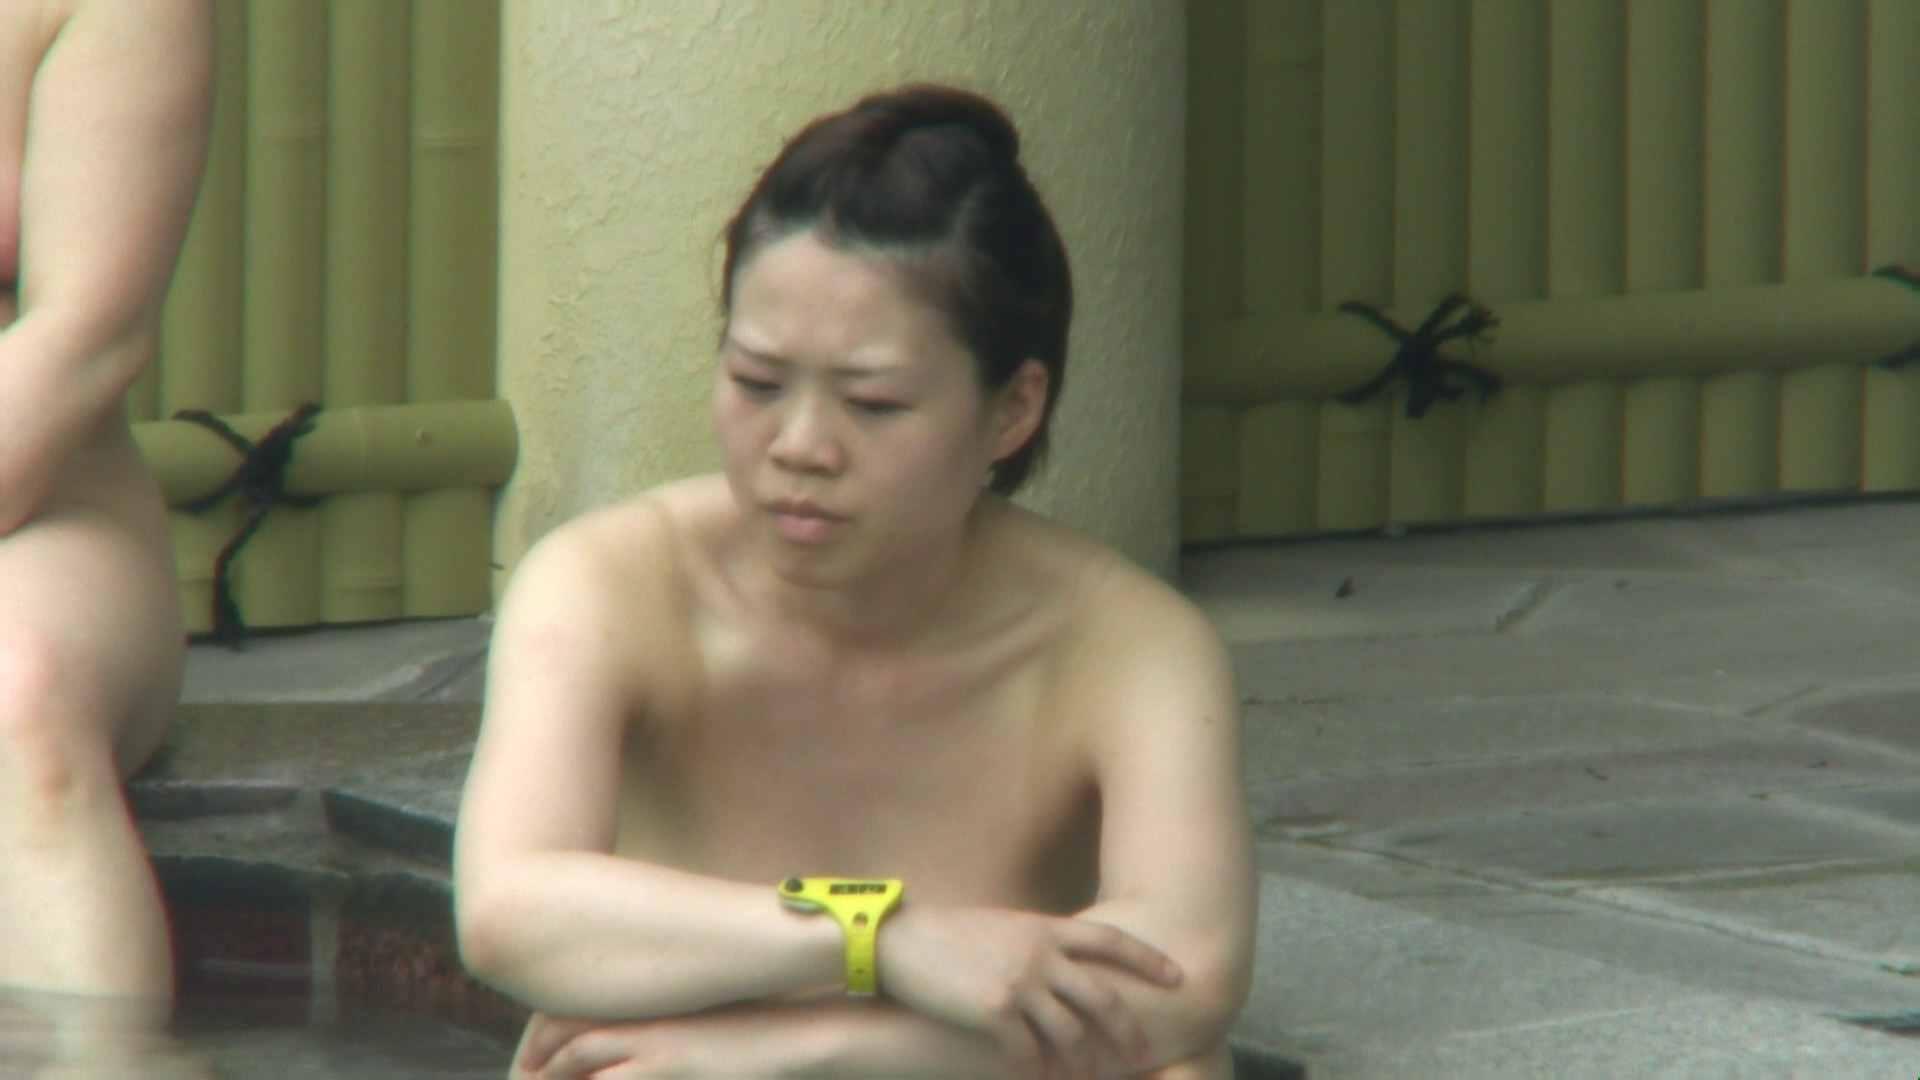 Aquaな露天風呂Vol.63【VIP限定】 露天風呂編 | 盗撮シリーズ  109PIX 41